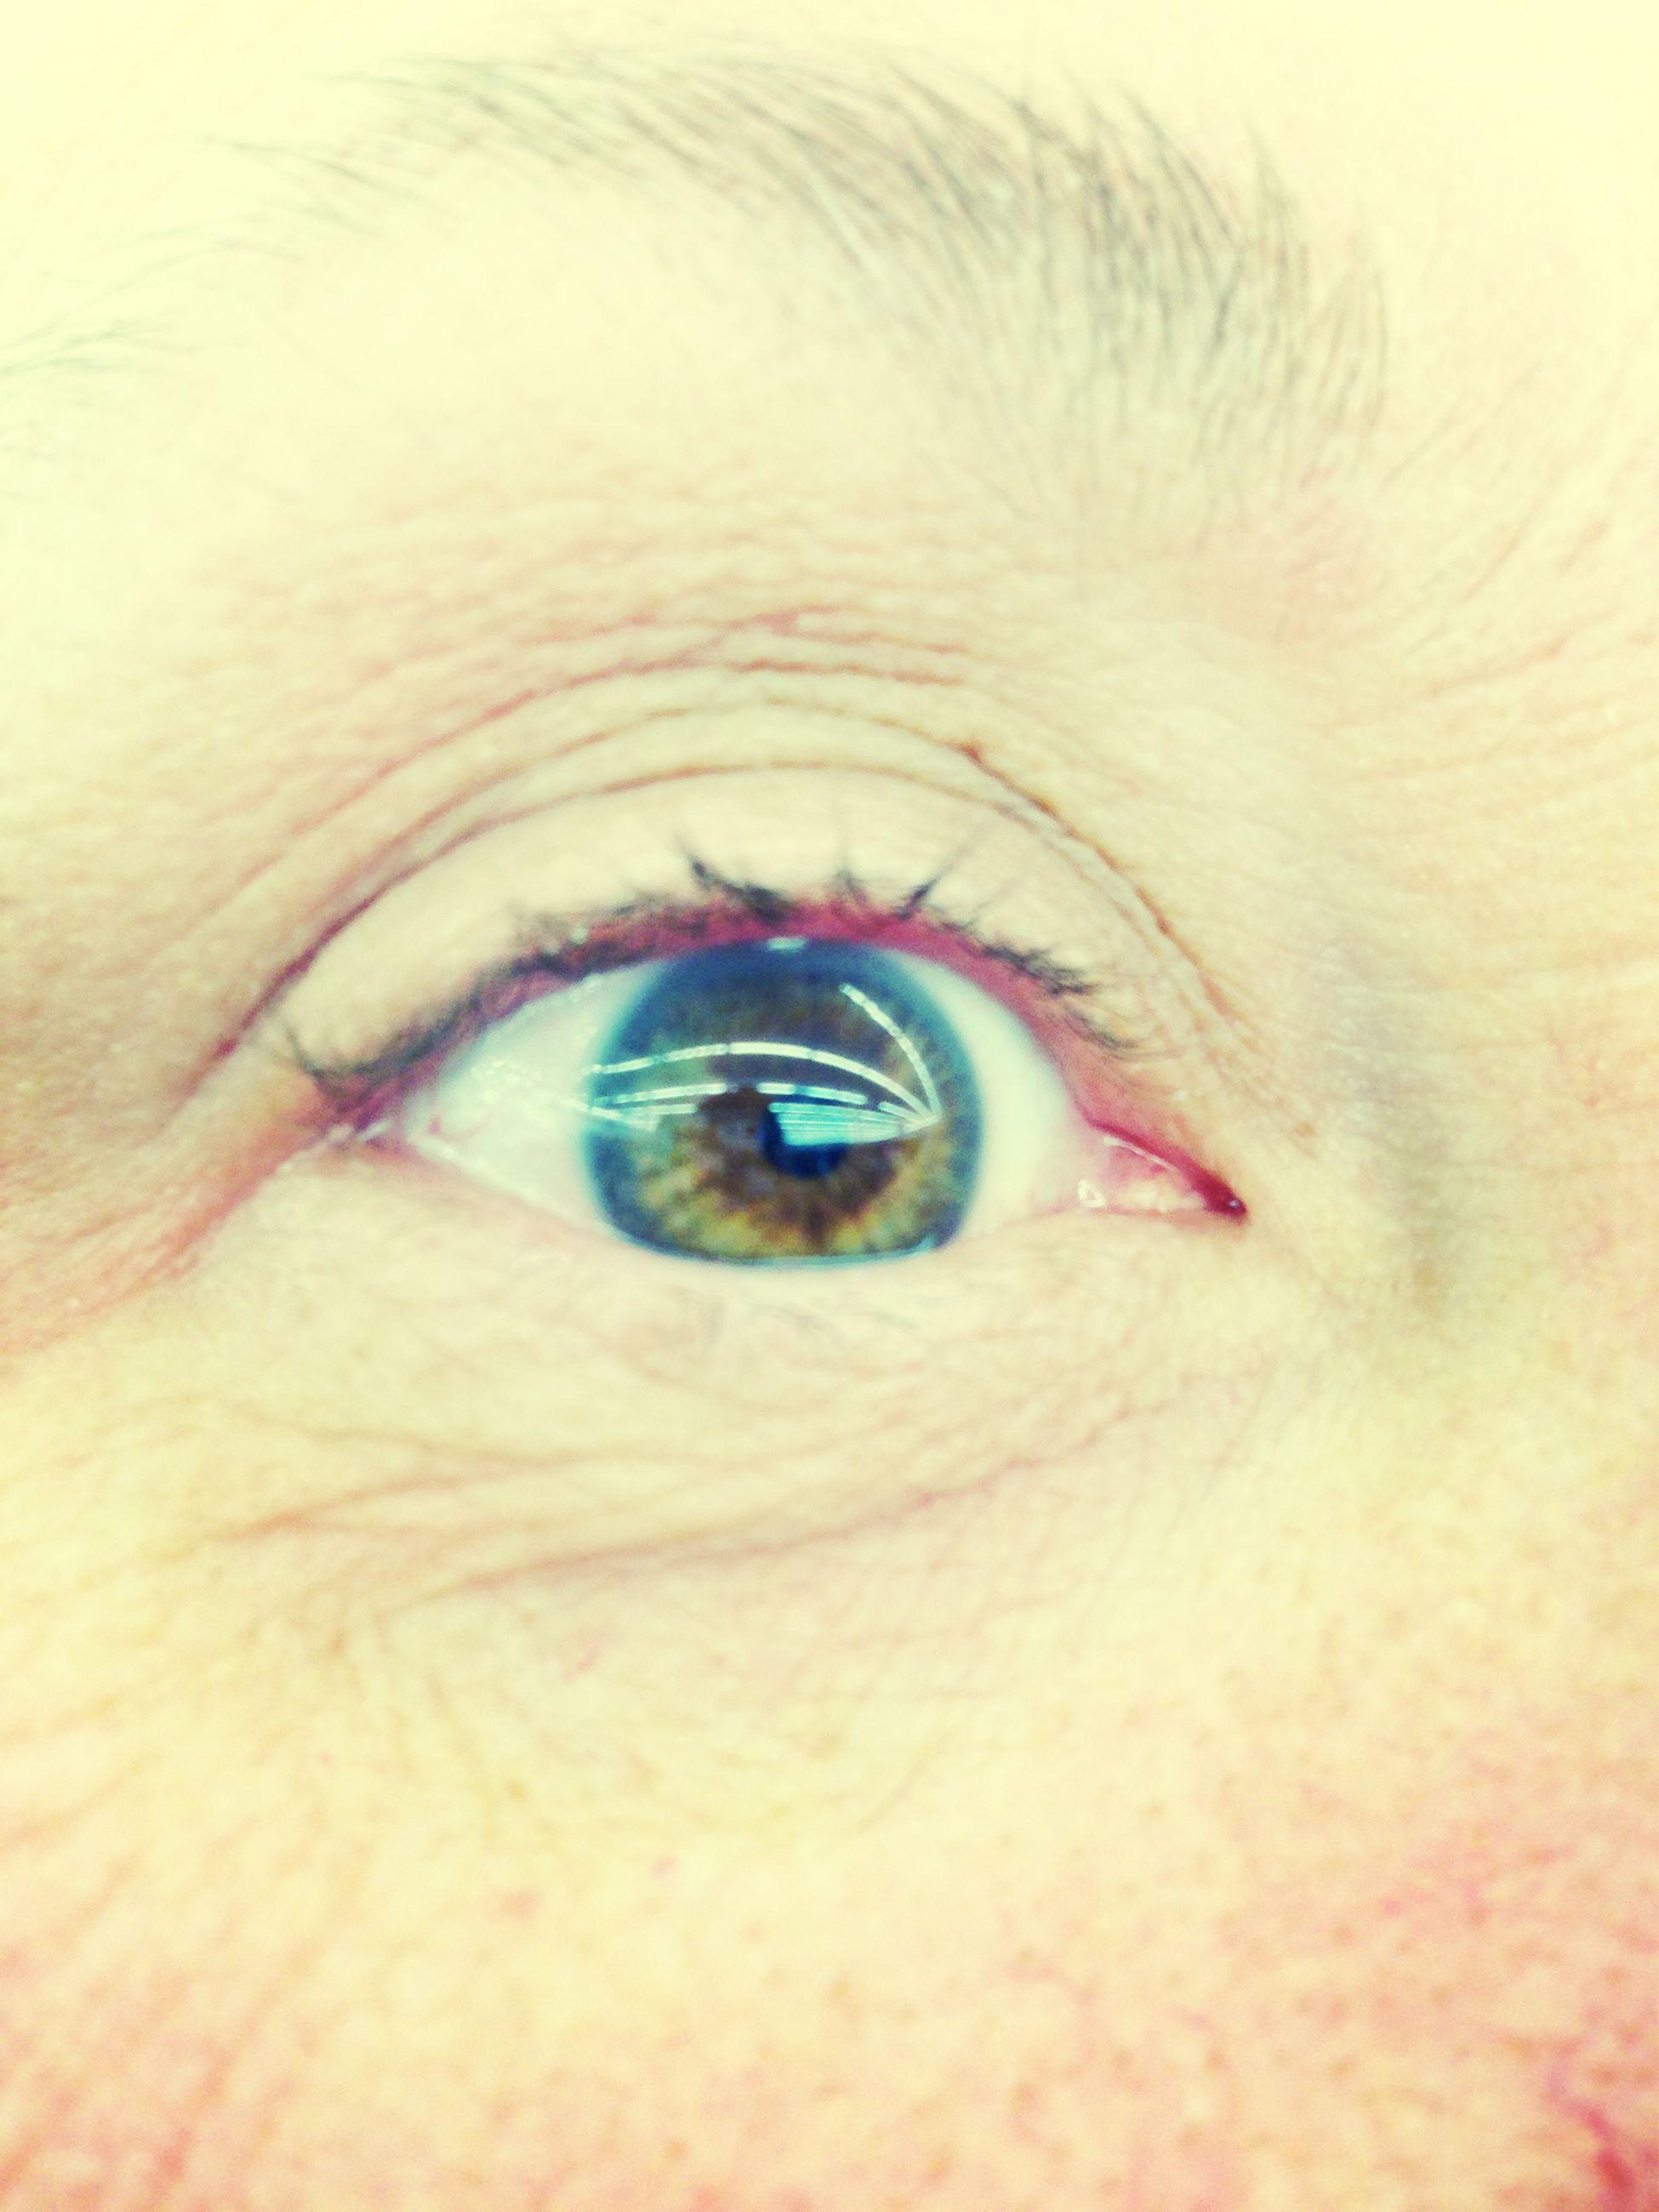 human eye, eyelash, close-up, eyesight, part of, sensory perception, portrait, full frame, looking at camera, eyeball, extreme close-up, iris - eye, extreme close up, human skin, unrecognizable person, backgrounds, eyebrow